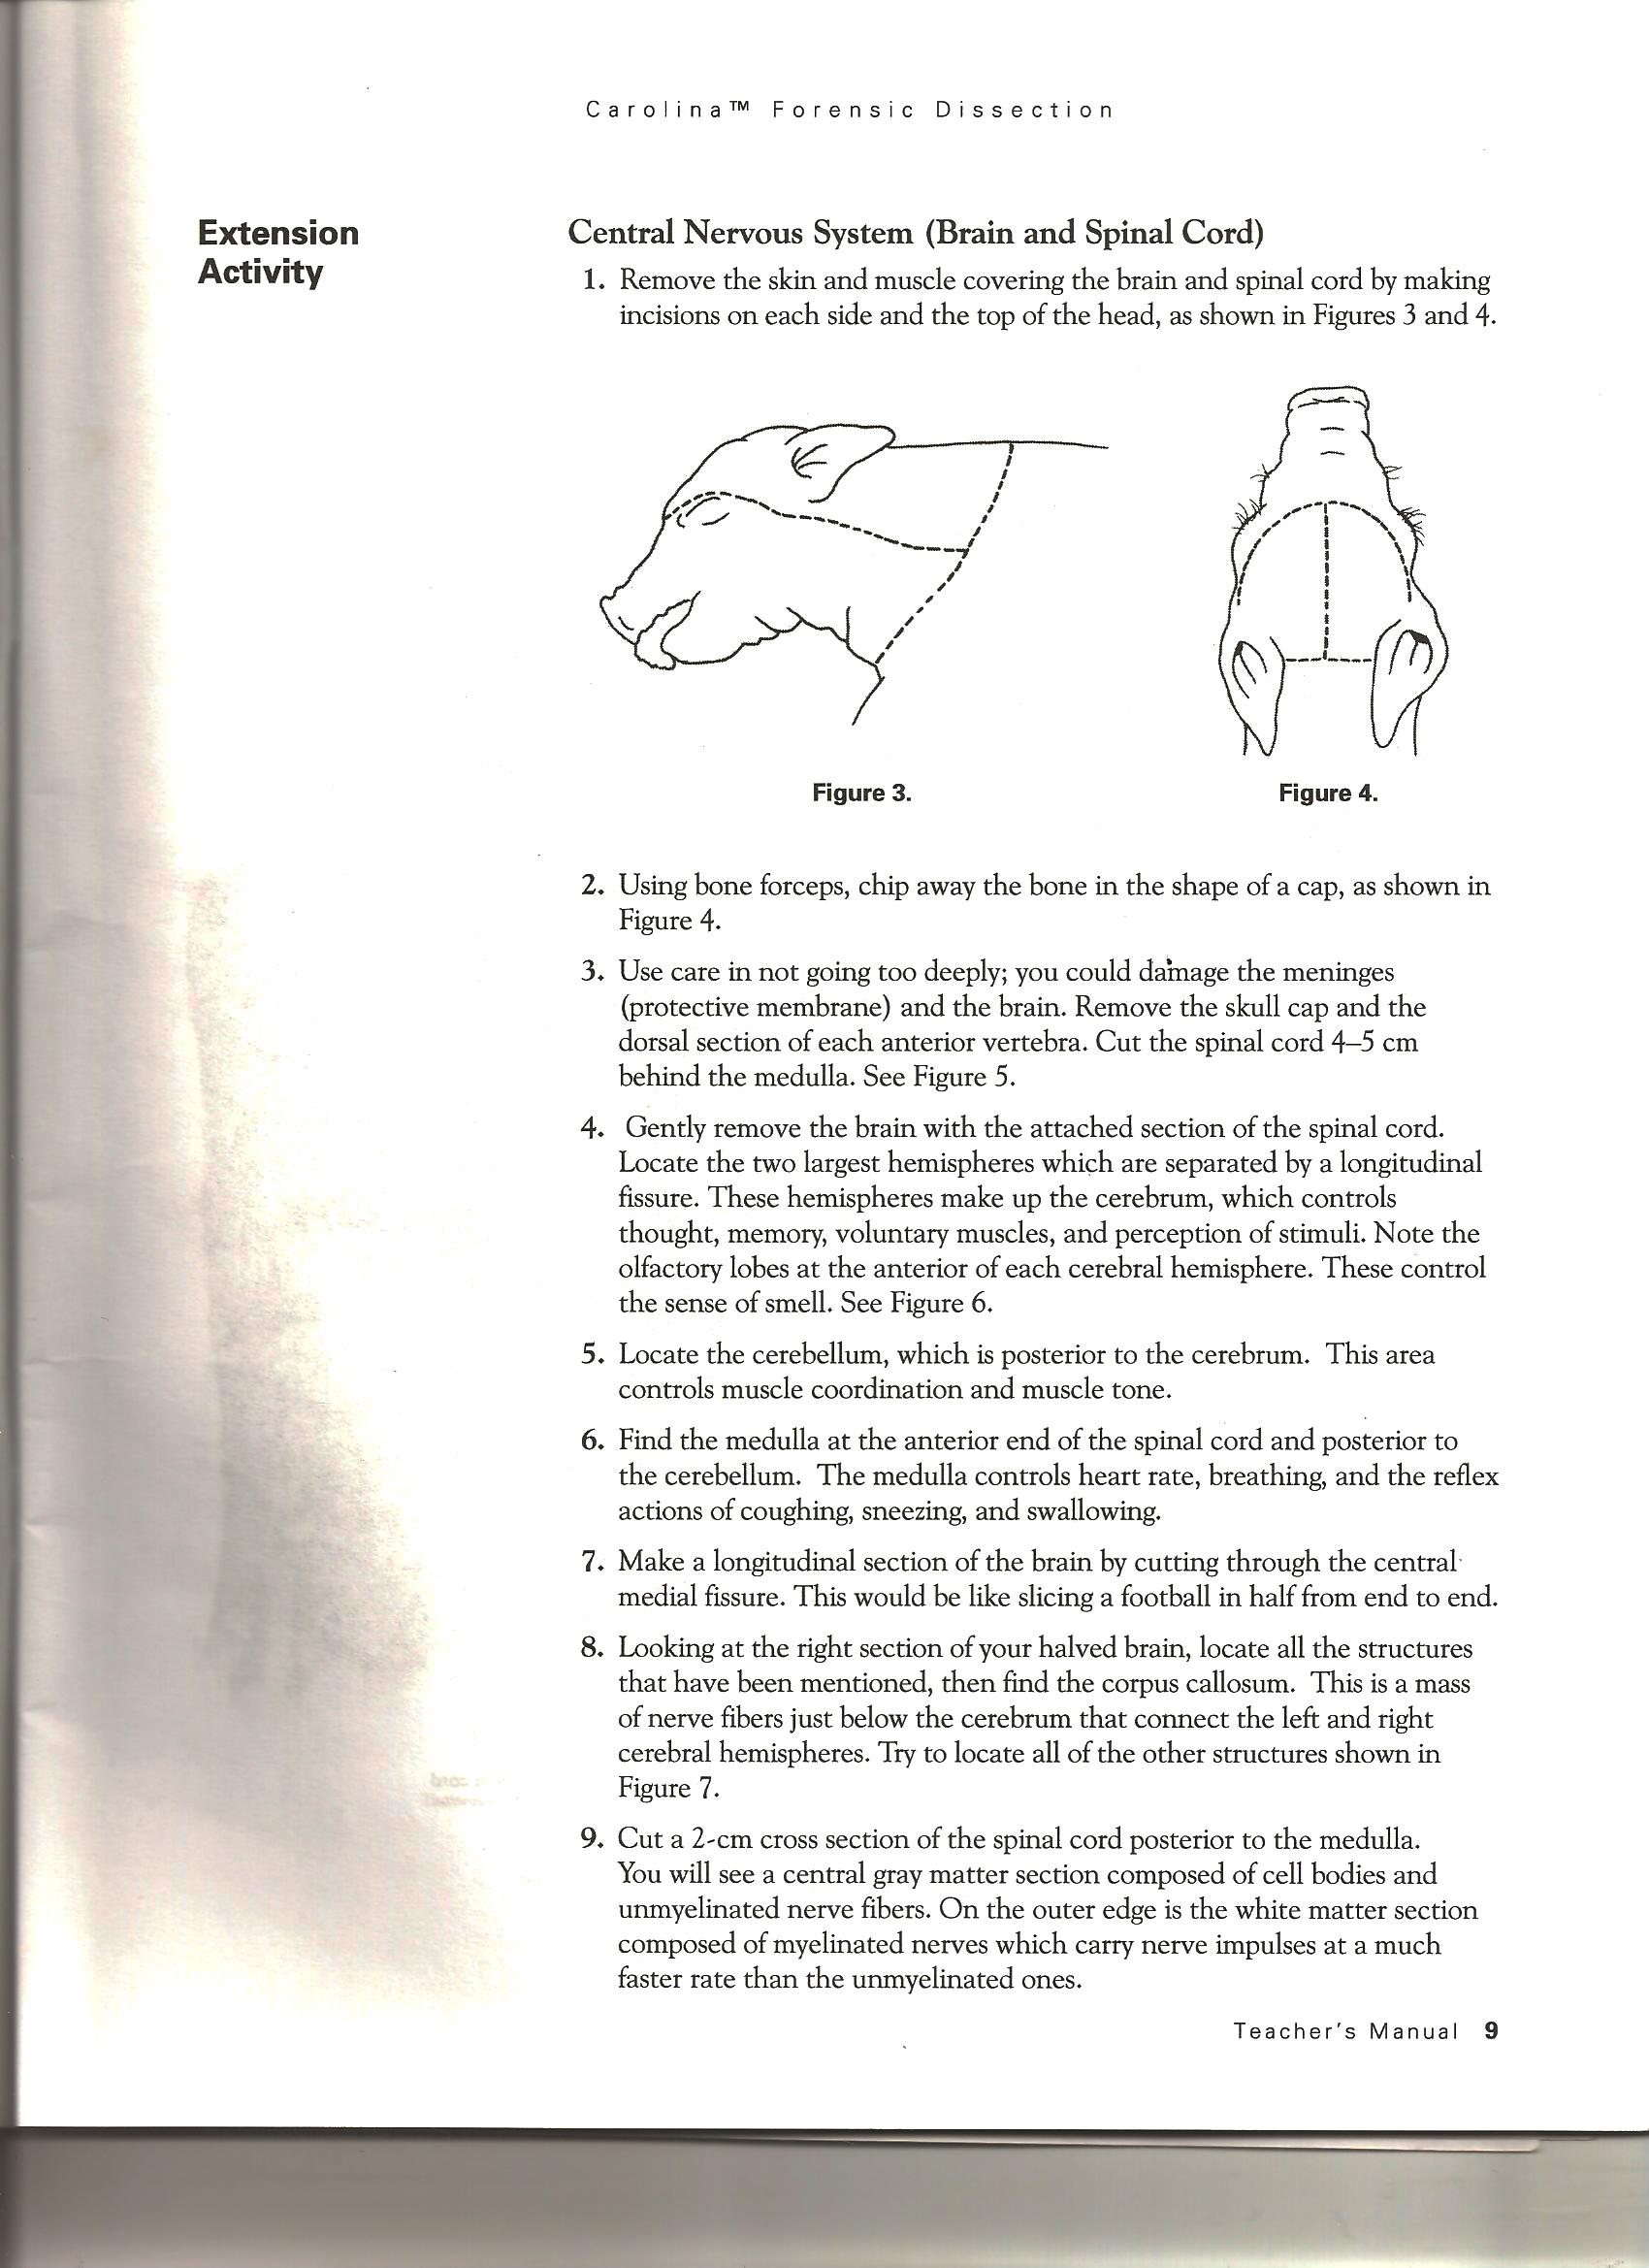 Pig Dissection Procedure 2